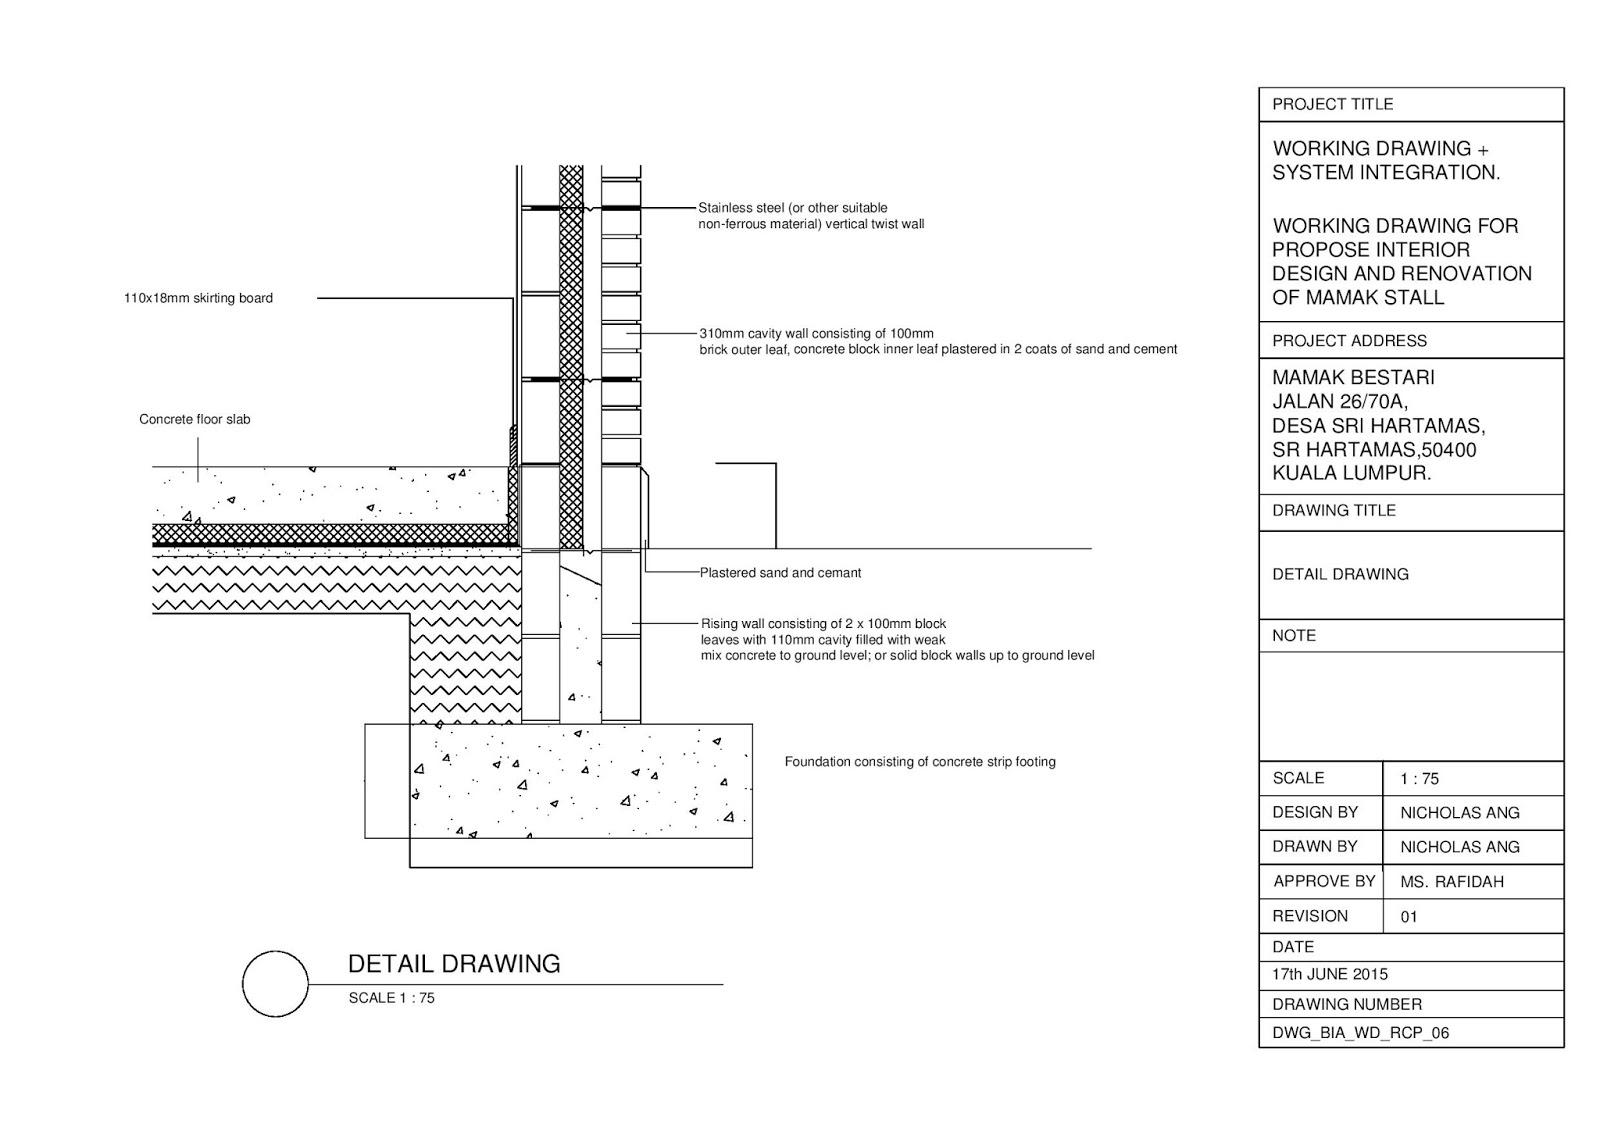 detailing & working drawings